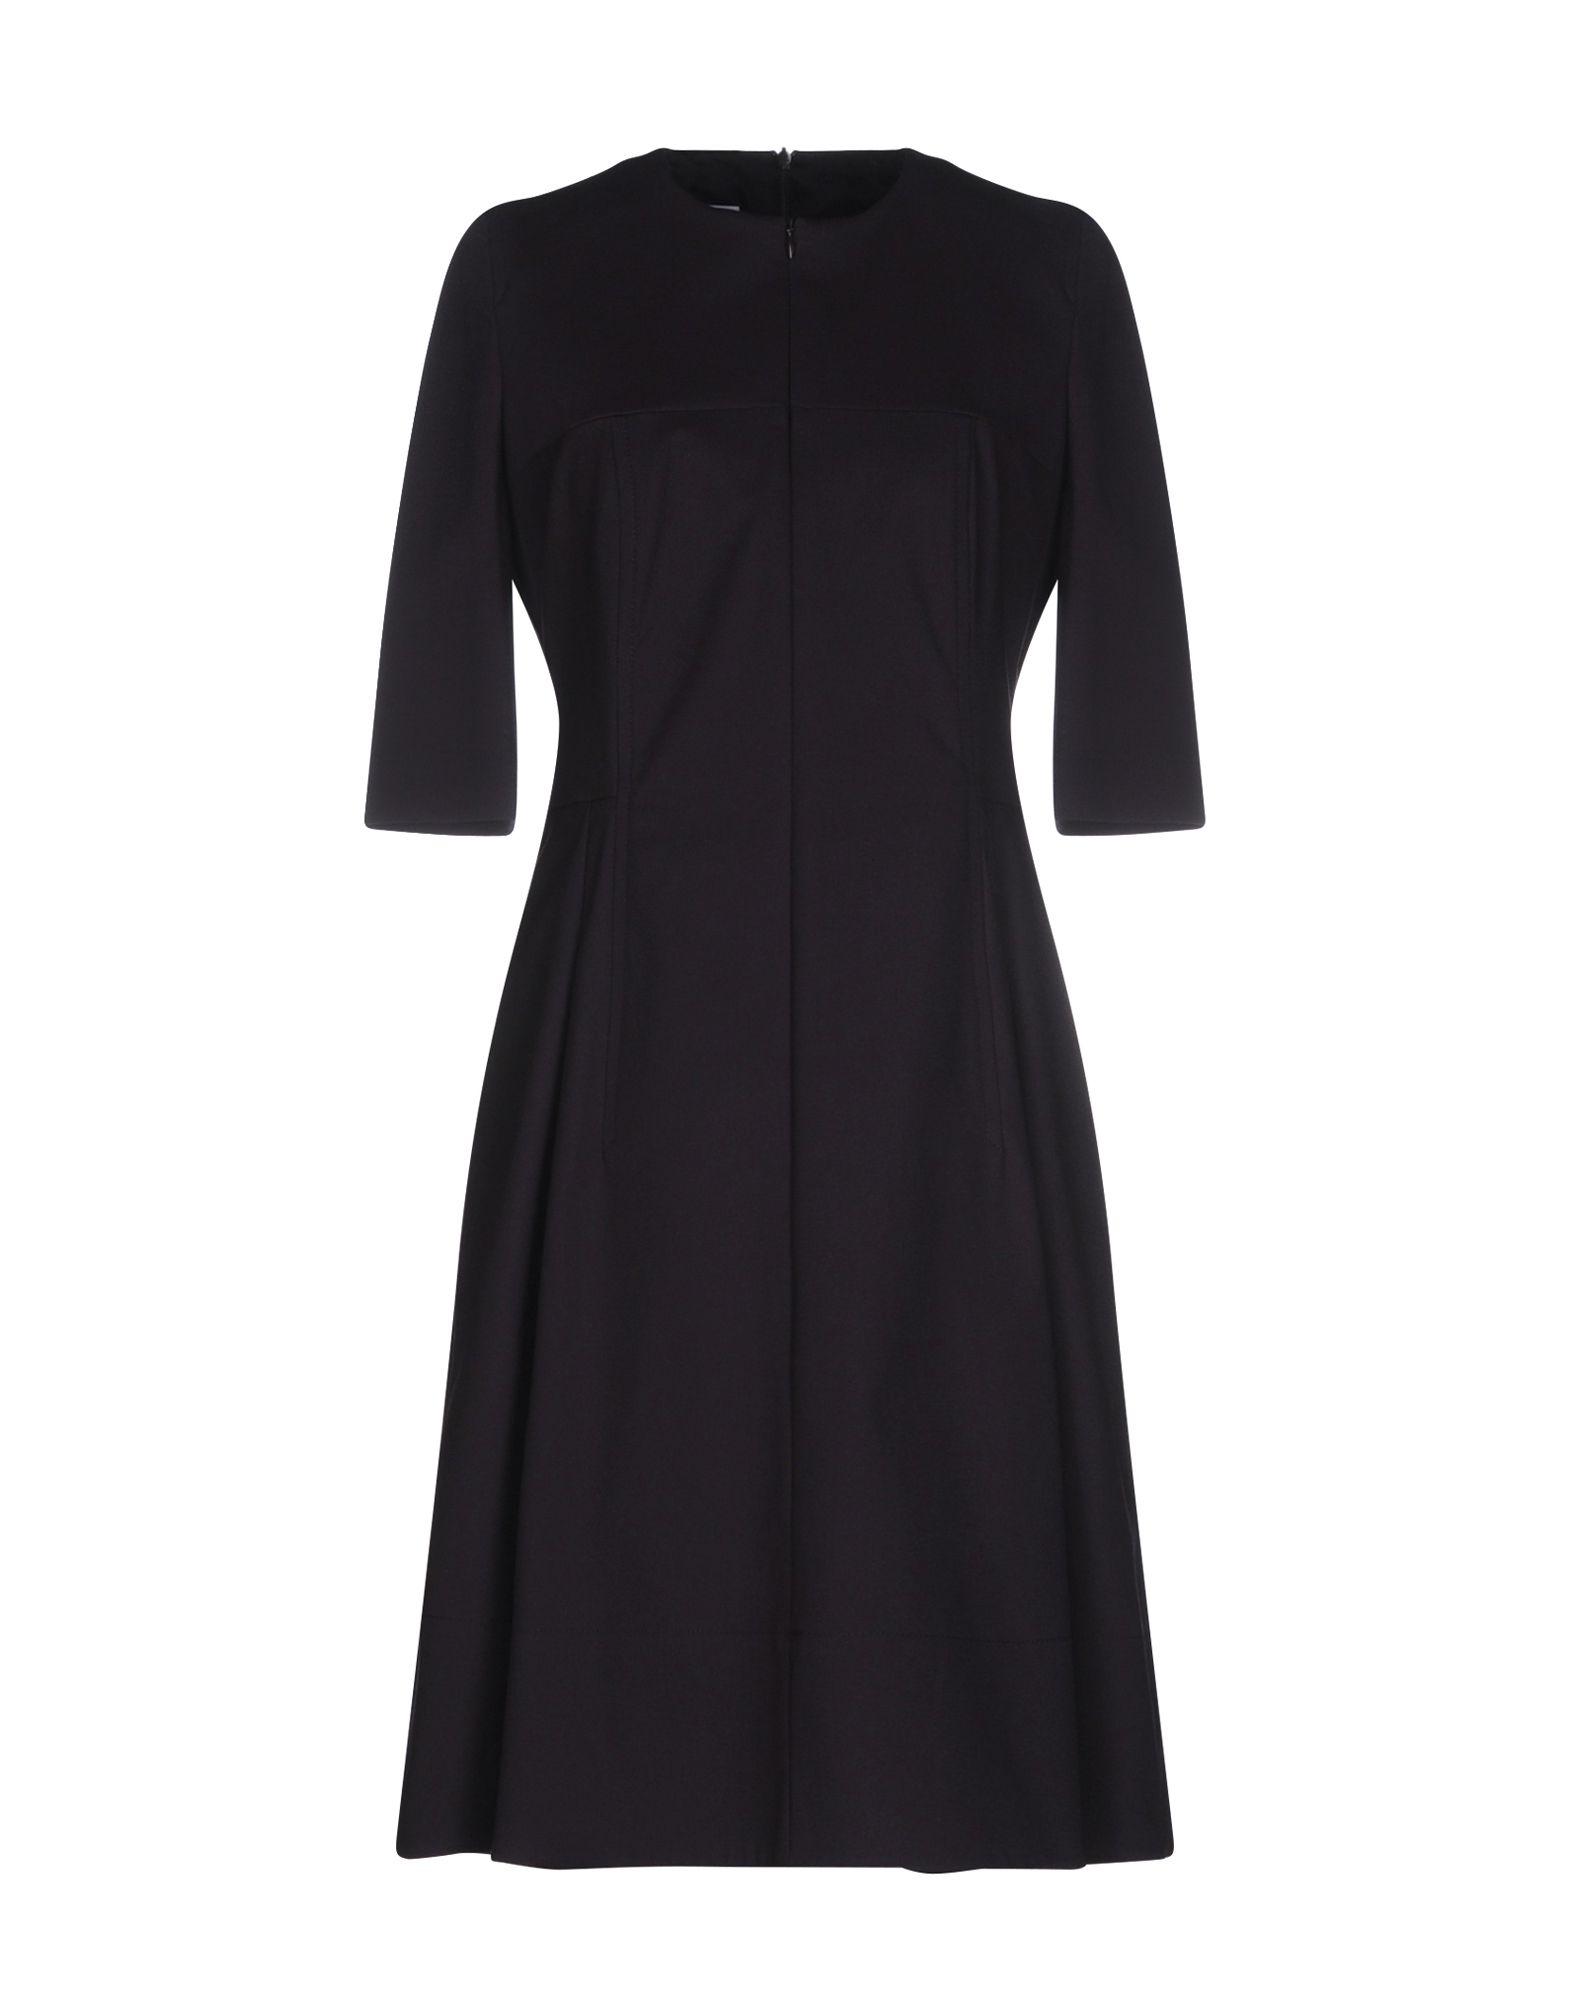 AKRIS PUNTO Short dresses. plain weave, solid color, round collar, long sleeves, no appliqués, no pockets, lined interior, rear closure, zip closure, stretch, trapeze dress. 96% Cotton, 4% Elastane